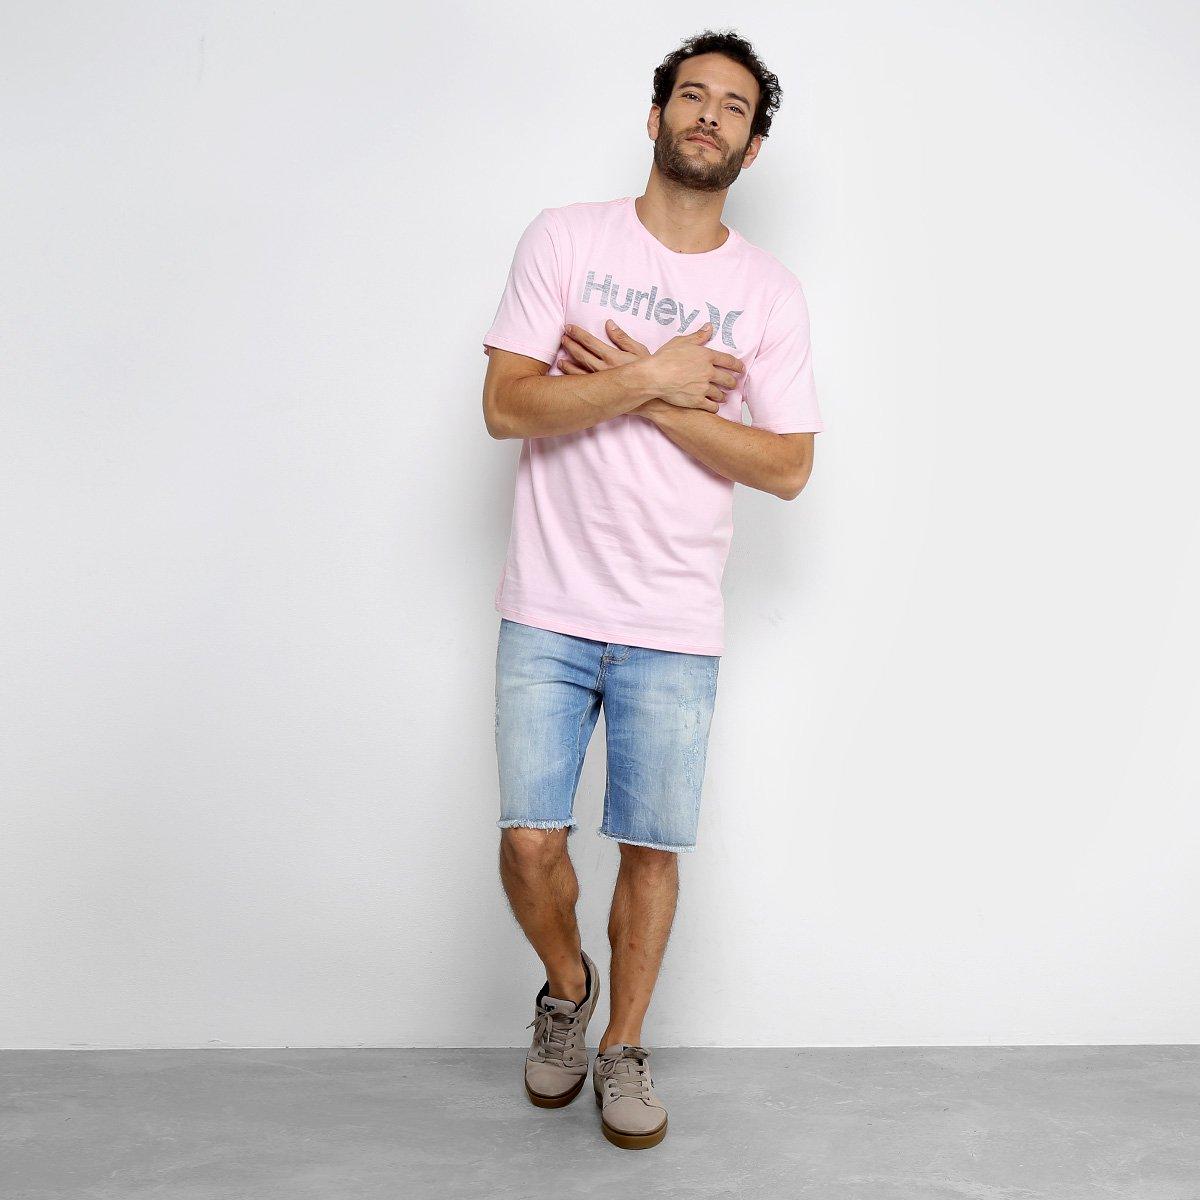 9214fc1c1a436 Camiseta Hurley Push Throught Masculina - Rosa - Compre Agora